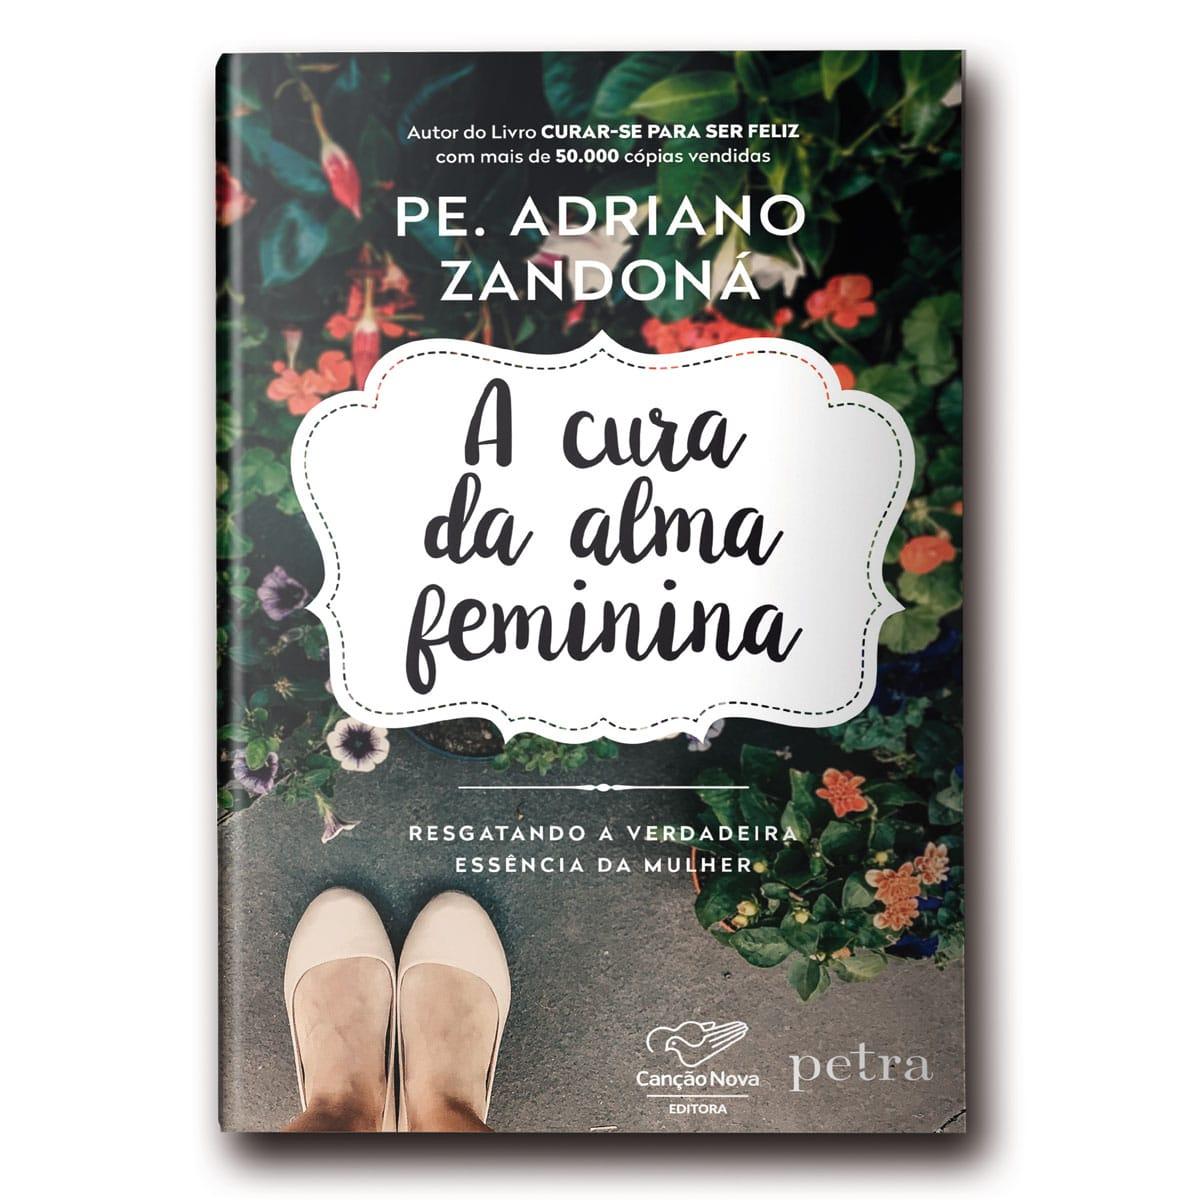 A Cura da Alma Feminina - Pe. Adriano Zandoná  - VindVedShop - Distribuidora Catolica